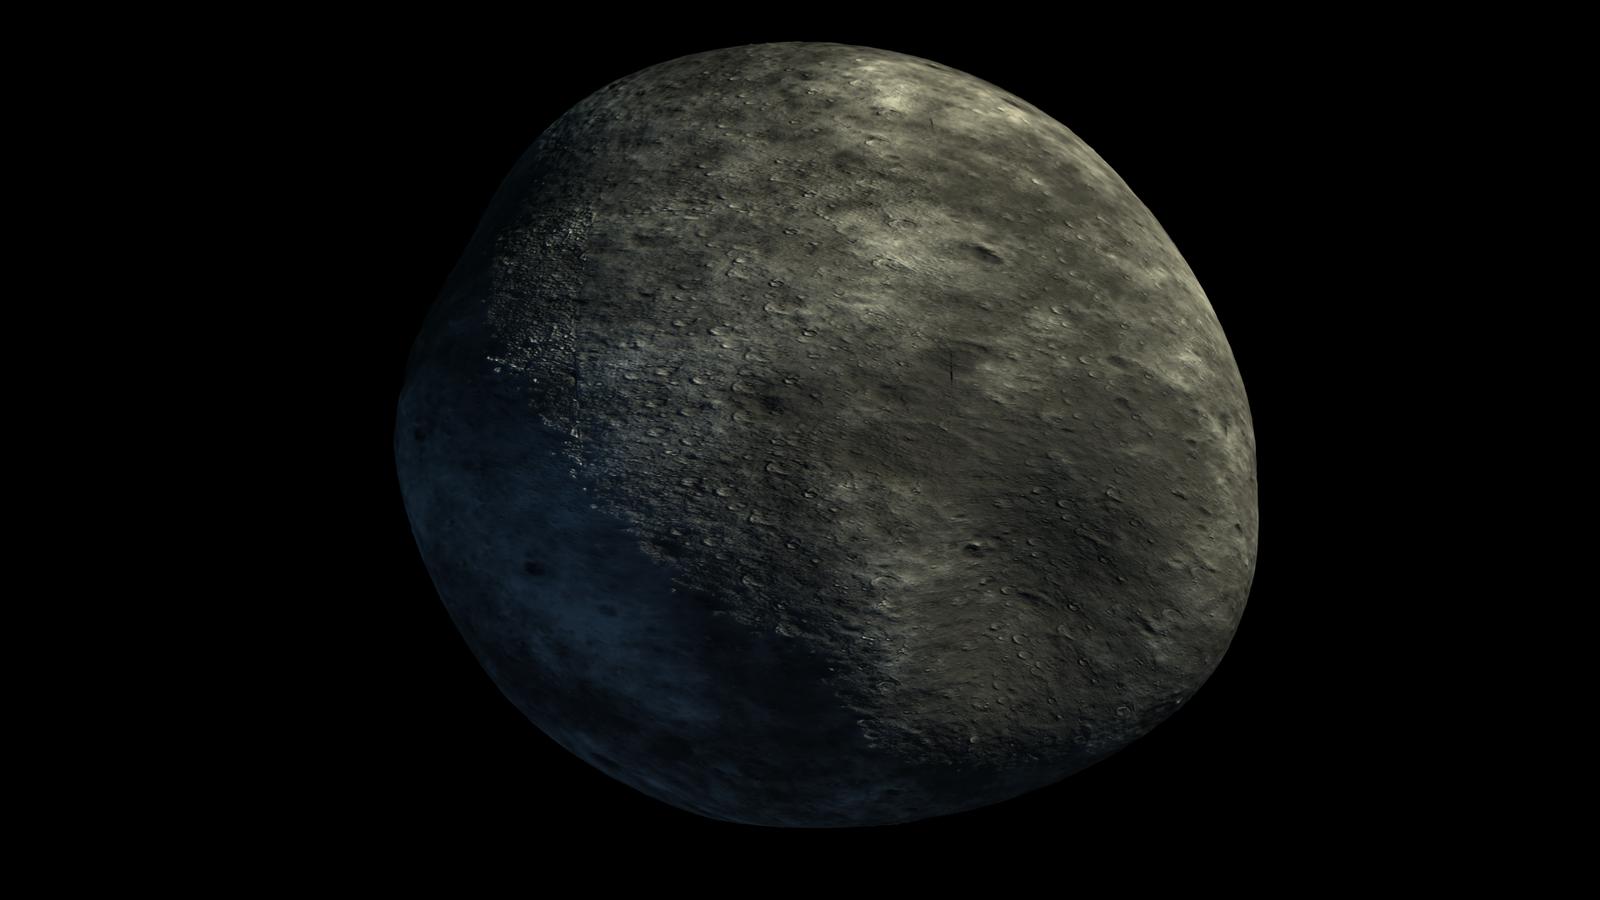 My portfolio: Asteroids